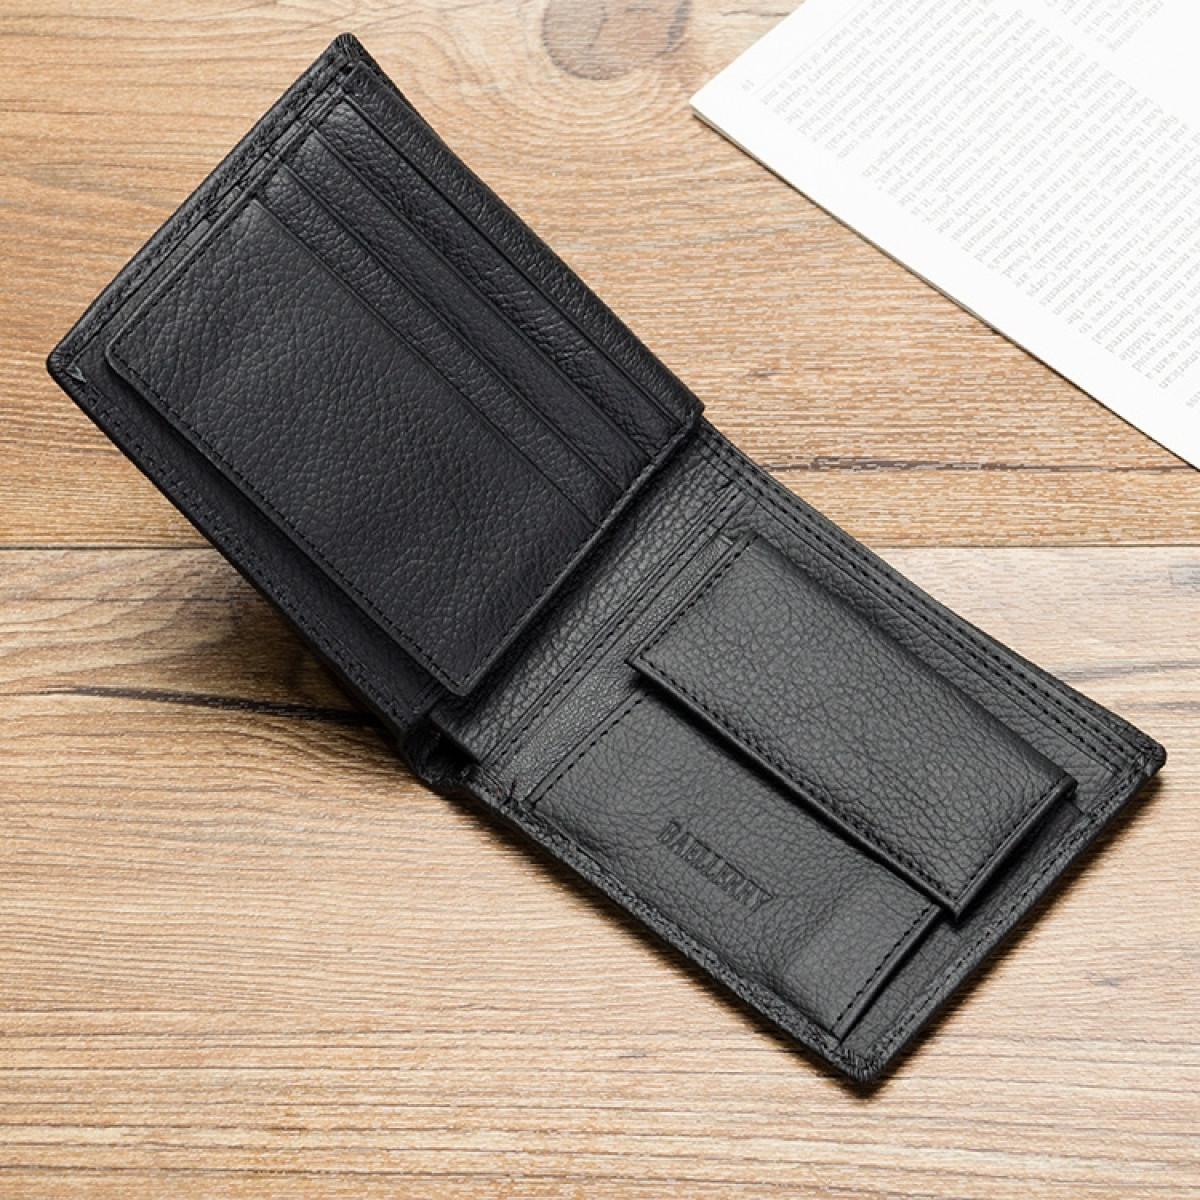 Moška usnjena denarnica Johny_6